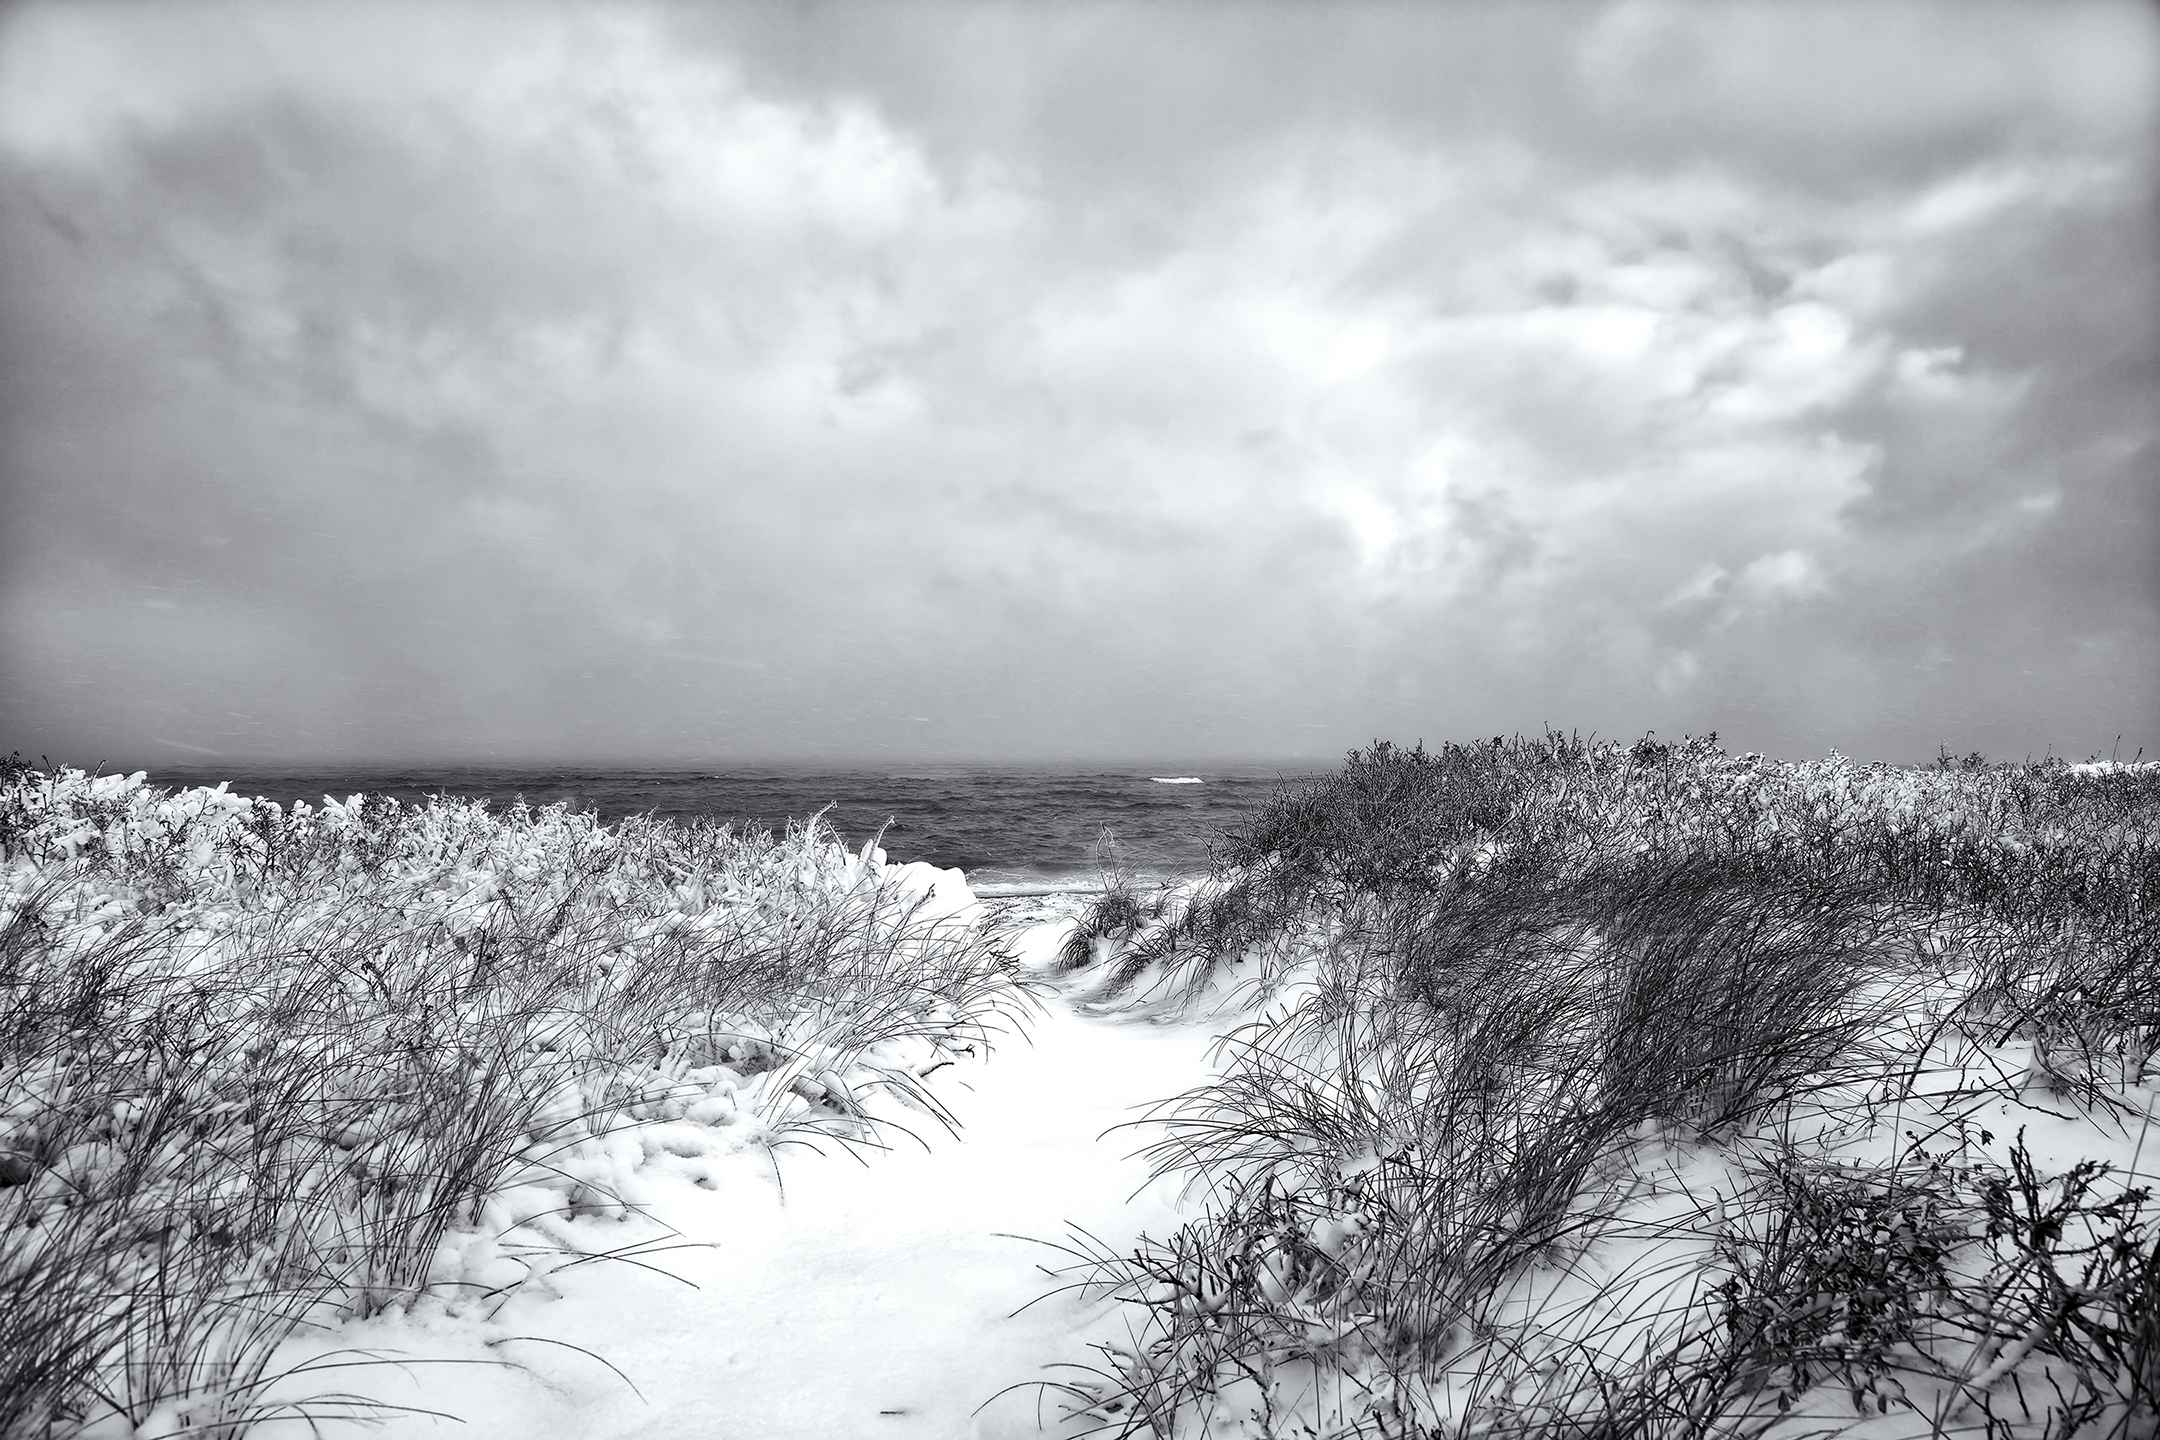 Winter Wave, 2016 by  Michael Stimola - Masterpiece Online